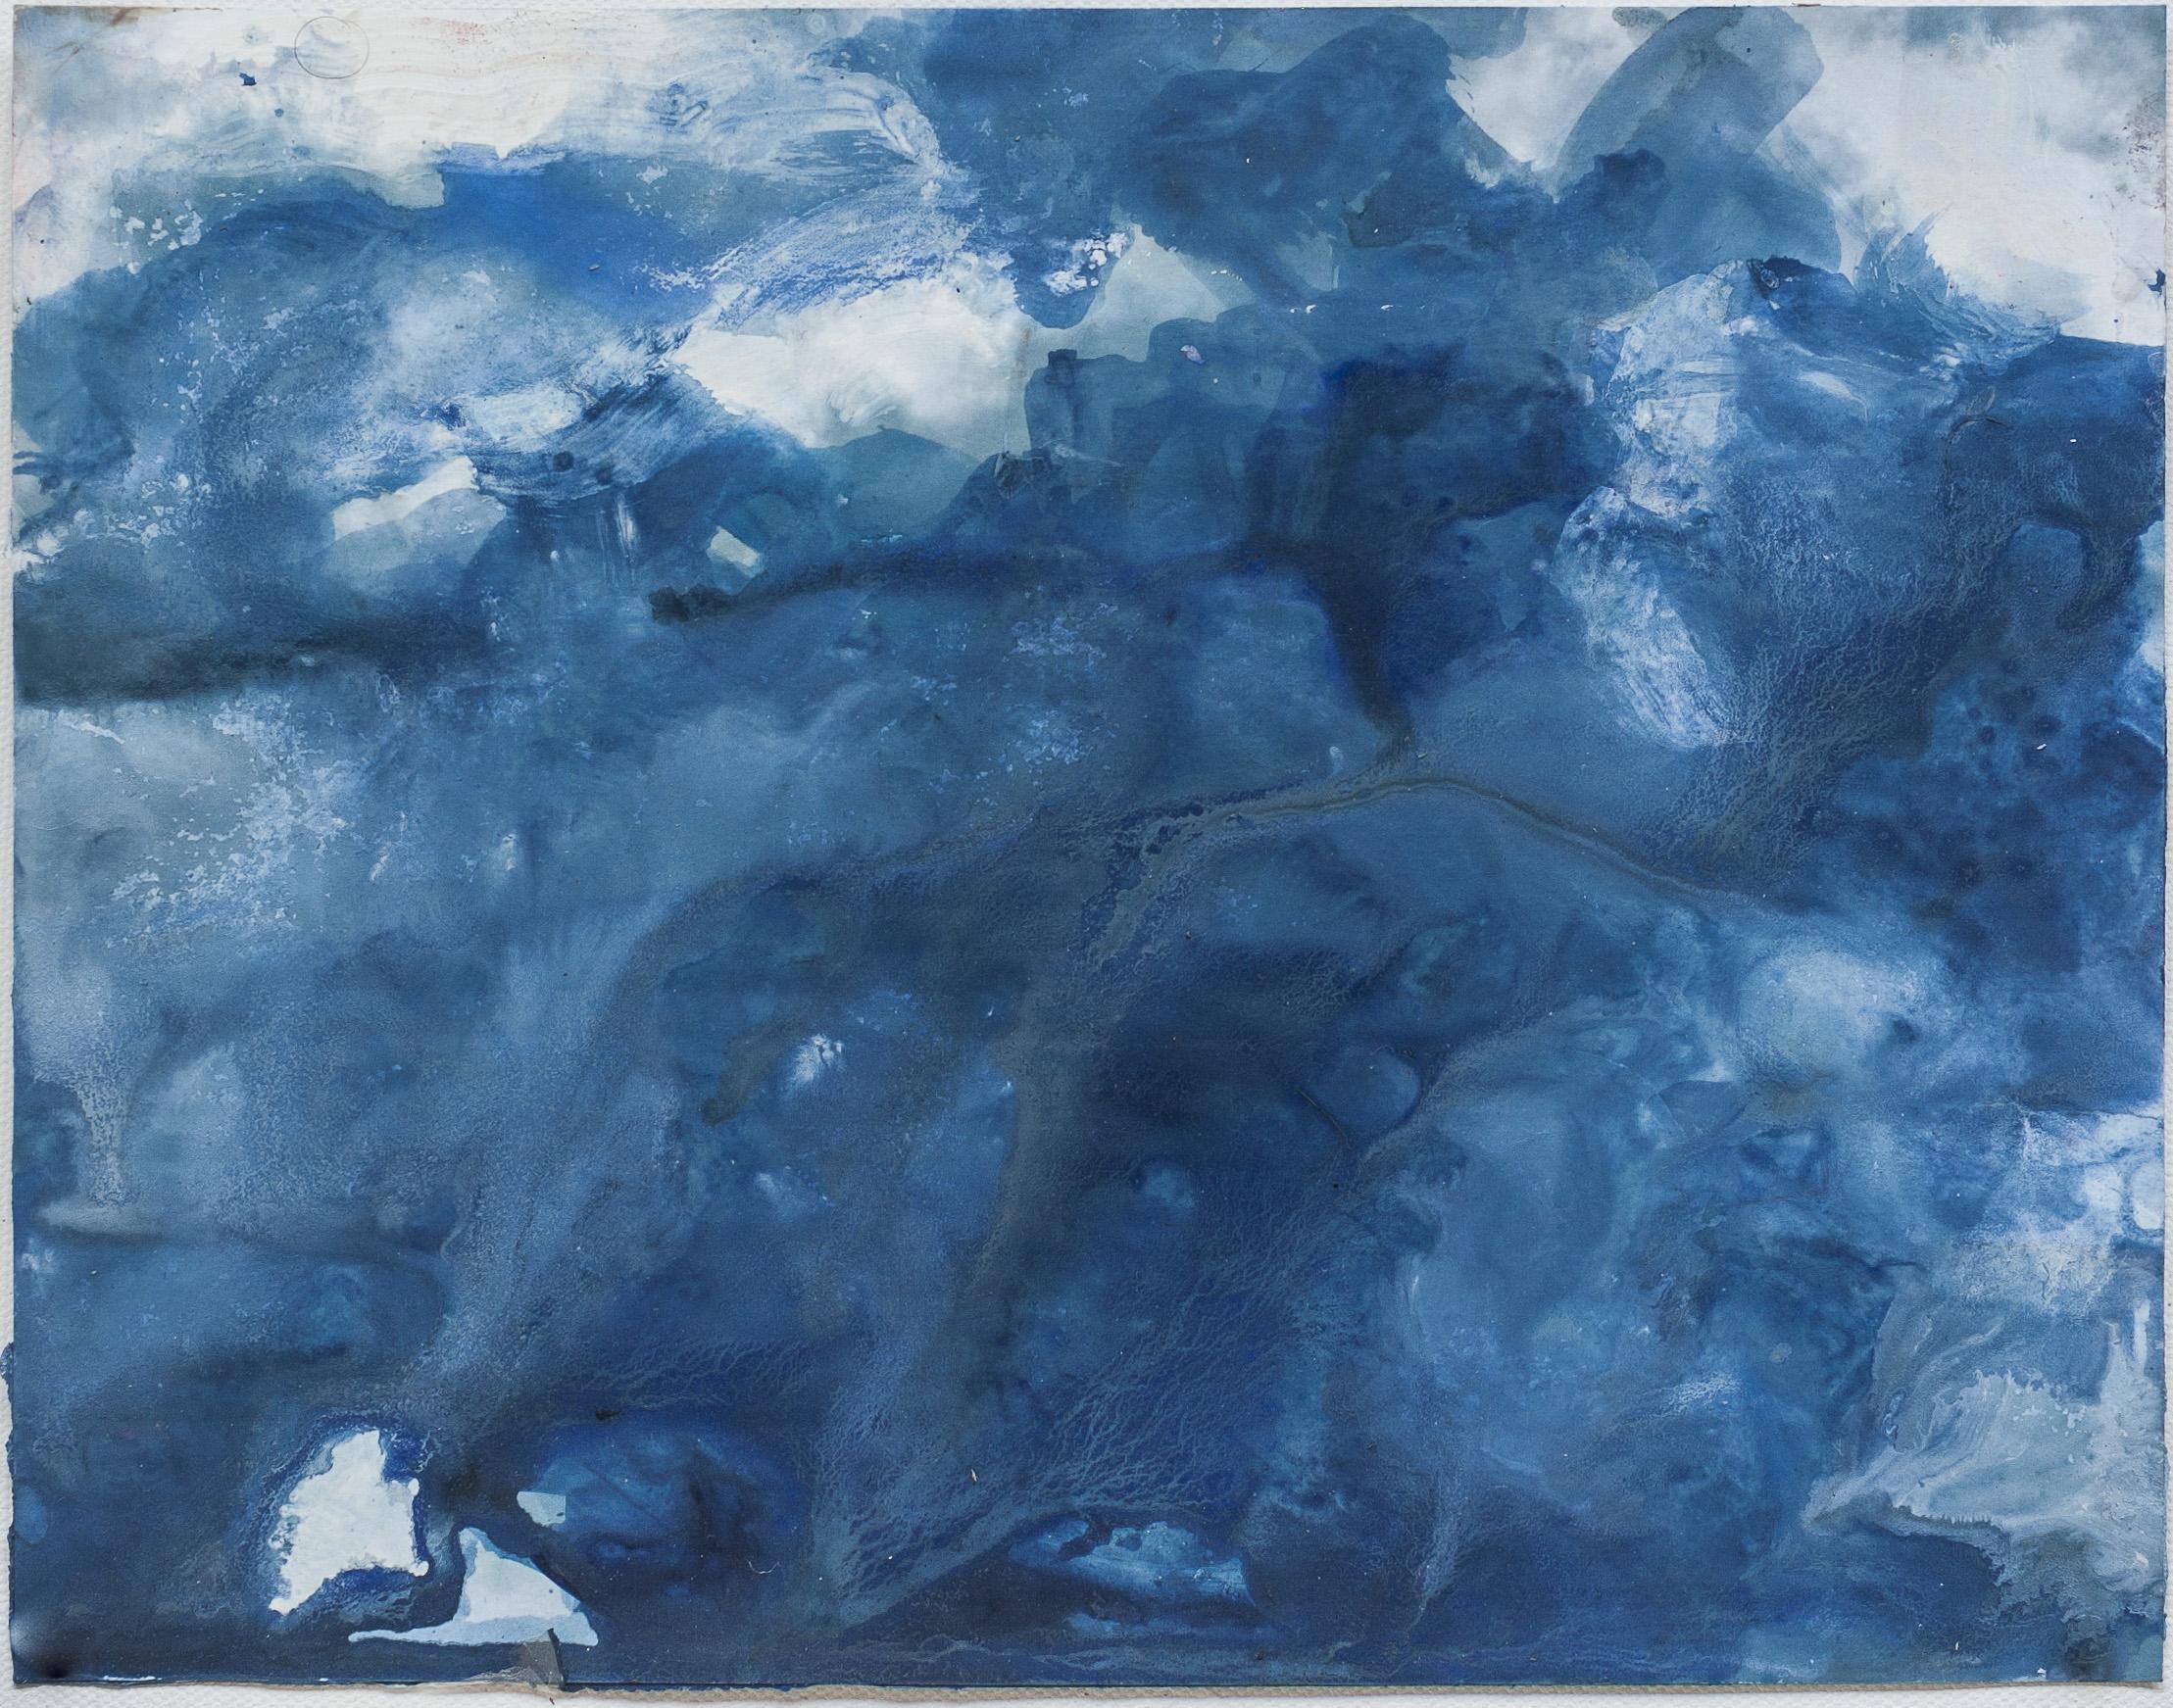 Blue Painting on Sky Walk Photograph  2016 acrylic on digital print 8.5 x 11 inches